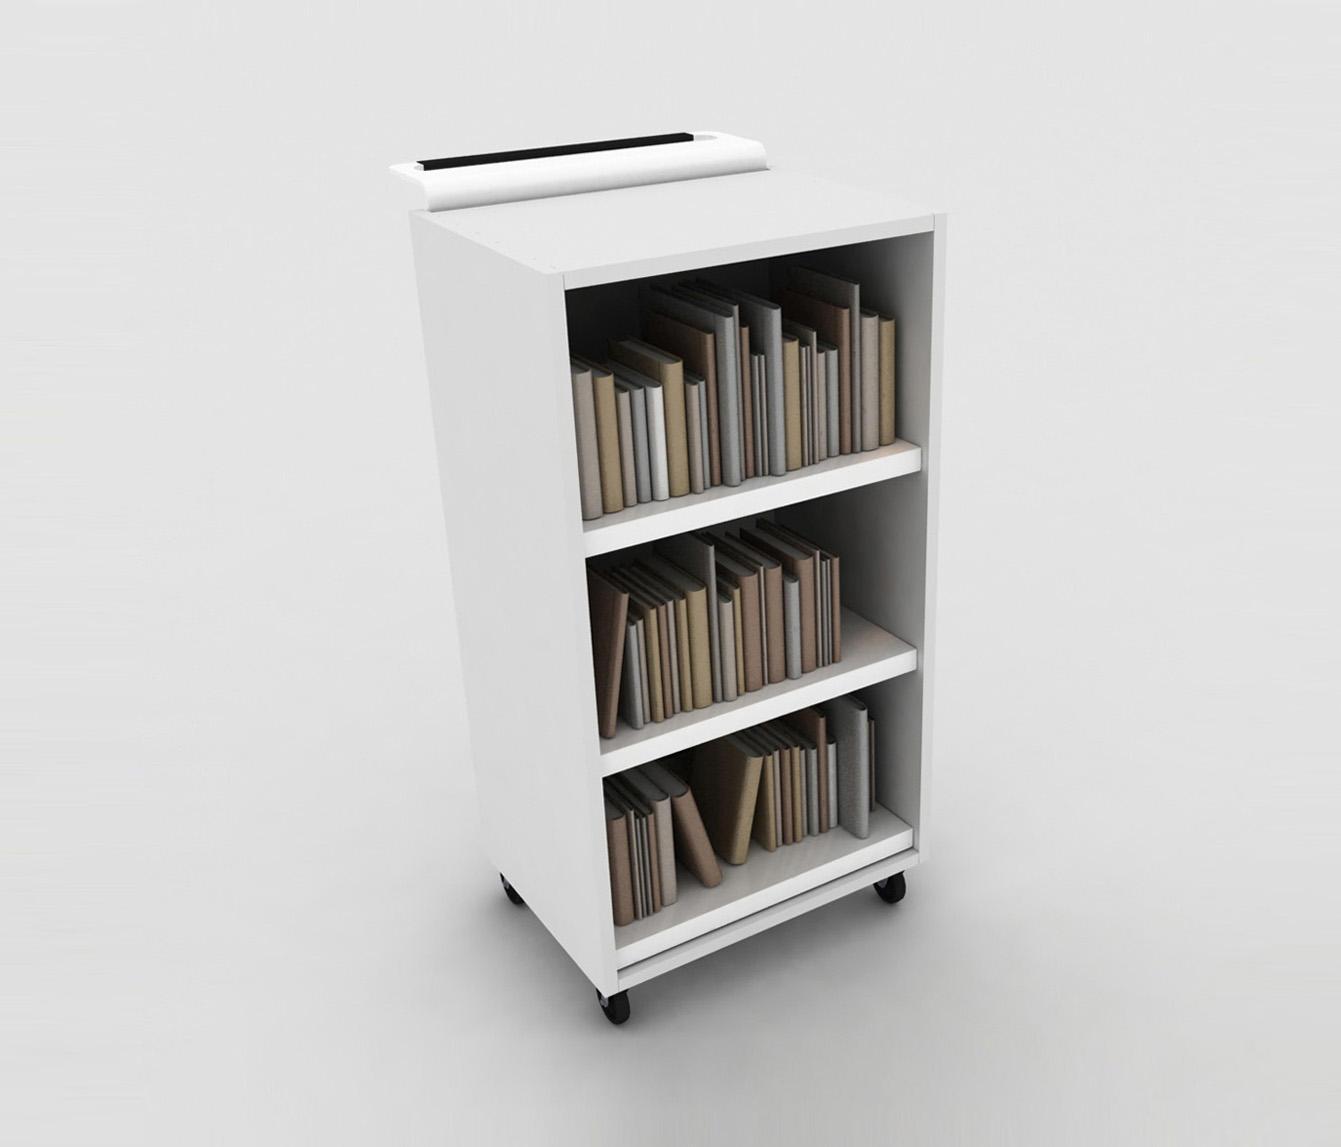 bk trolley carrelli da biblioteca idm coupechoux architonic. Black Bedroom Furniture Sets. Home Design Ideas